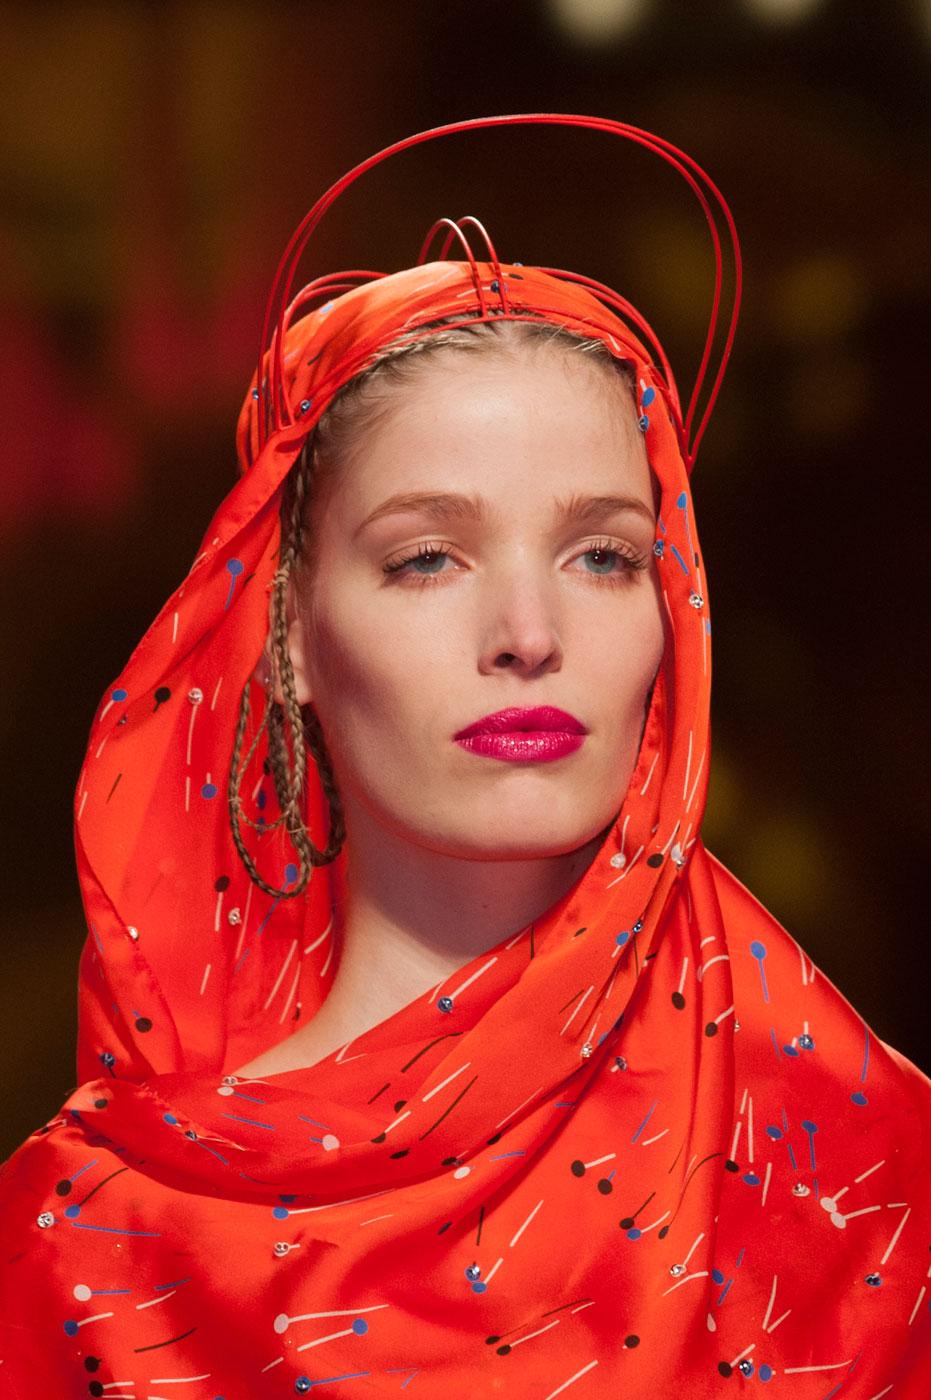 Schiaparelli-fashion-runway-show-close-ups-haute-couture-paris-spring-summer-2015-the-impression-02